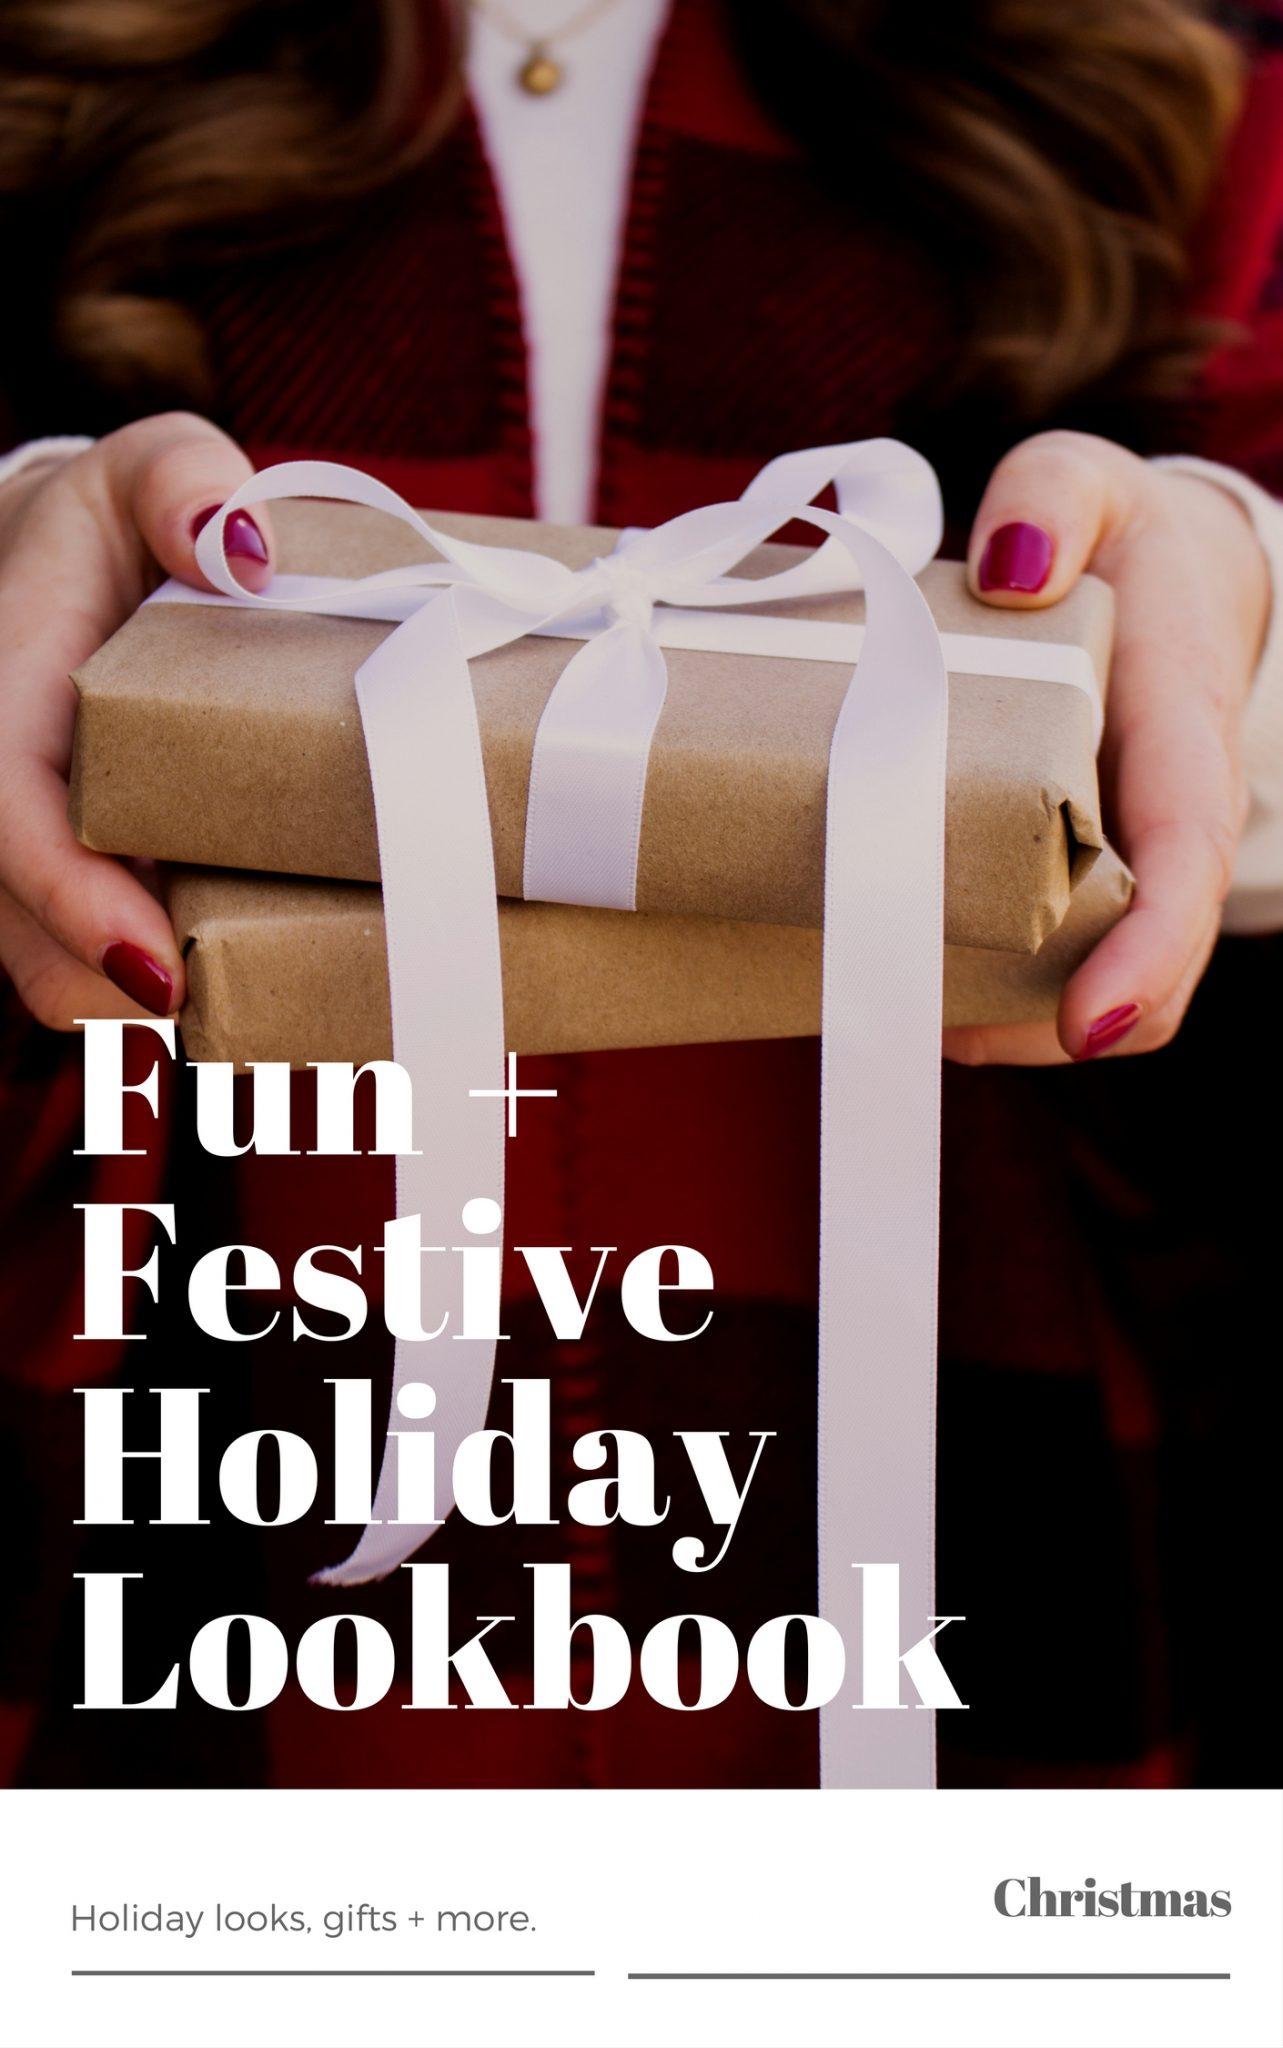 Fun + Festive Holiday Lookbook Christmas